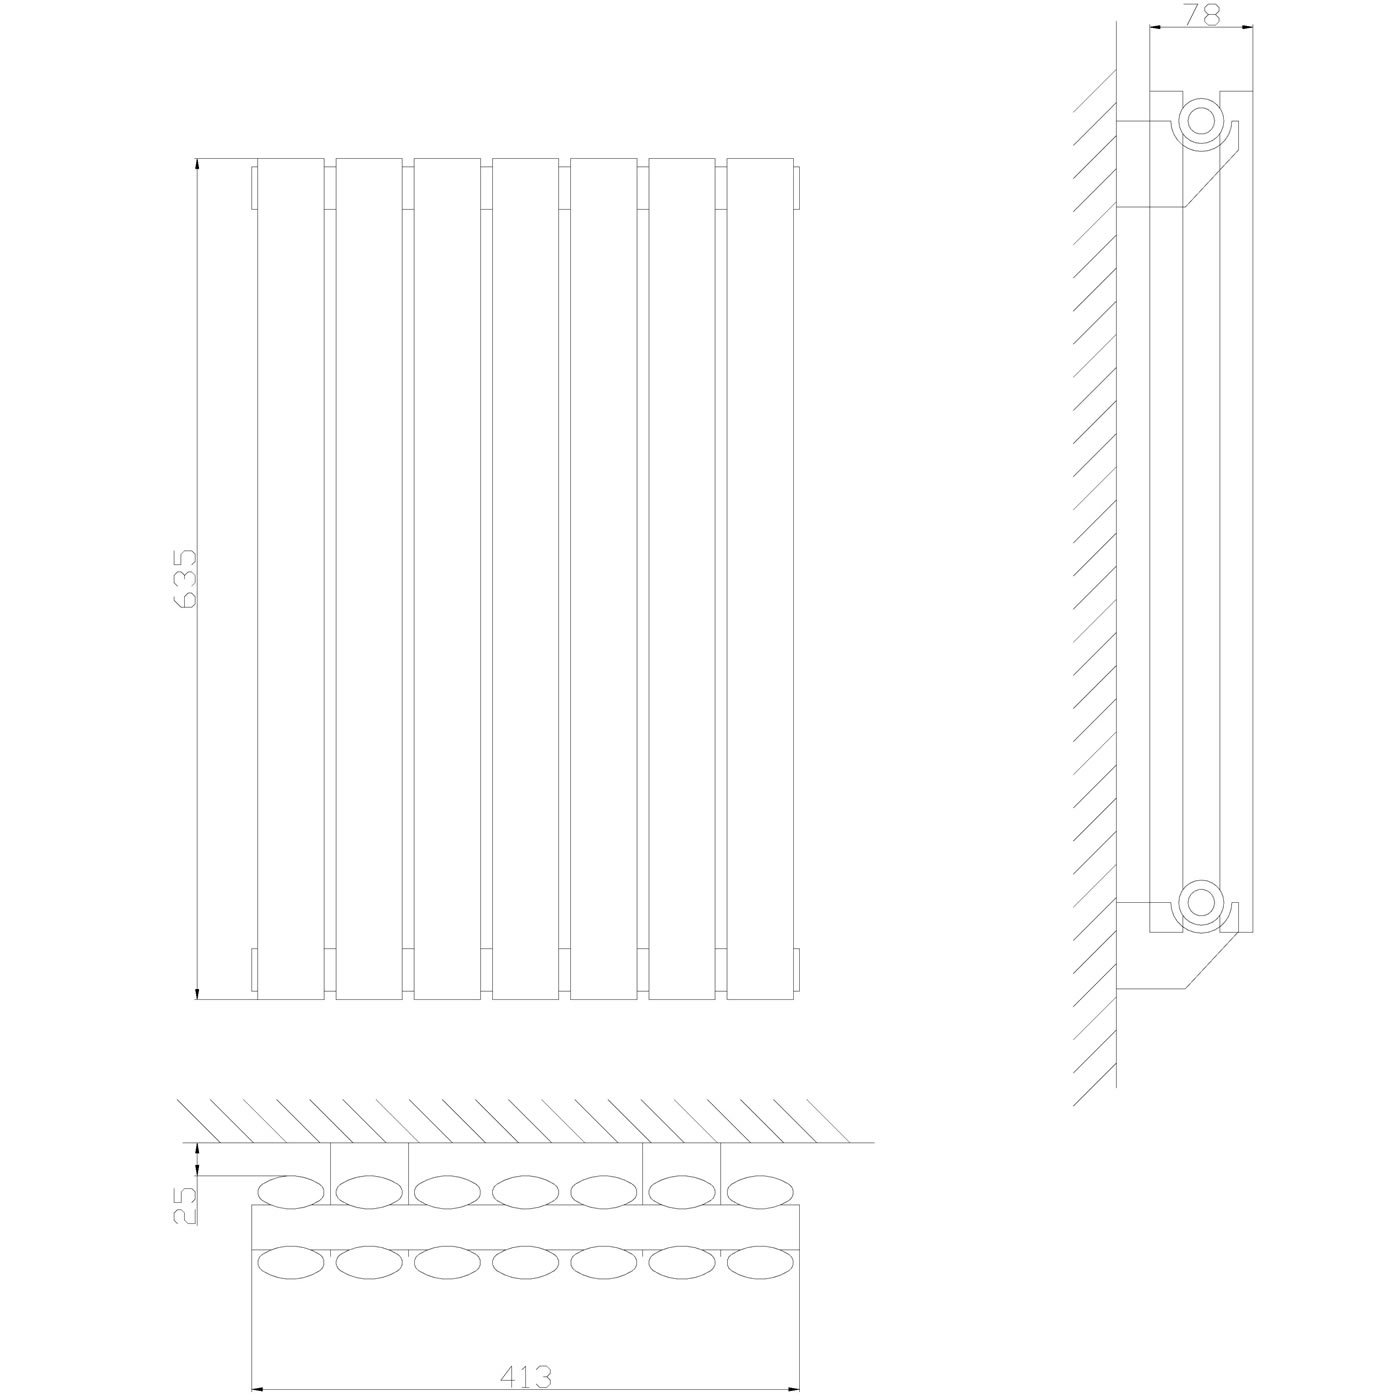 Dise/ño de Columna Calefacci/ón Acabado Antracita 932W 635 x 590mm Hudson Reed Radiador Revive Horizontal con Calefacci/ón de Dise/ño Moderno